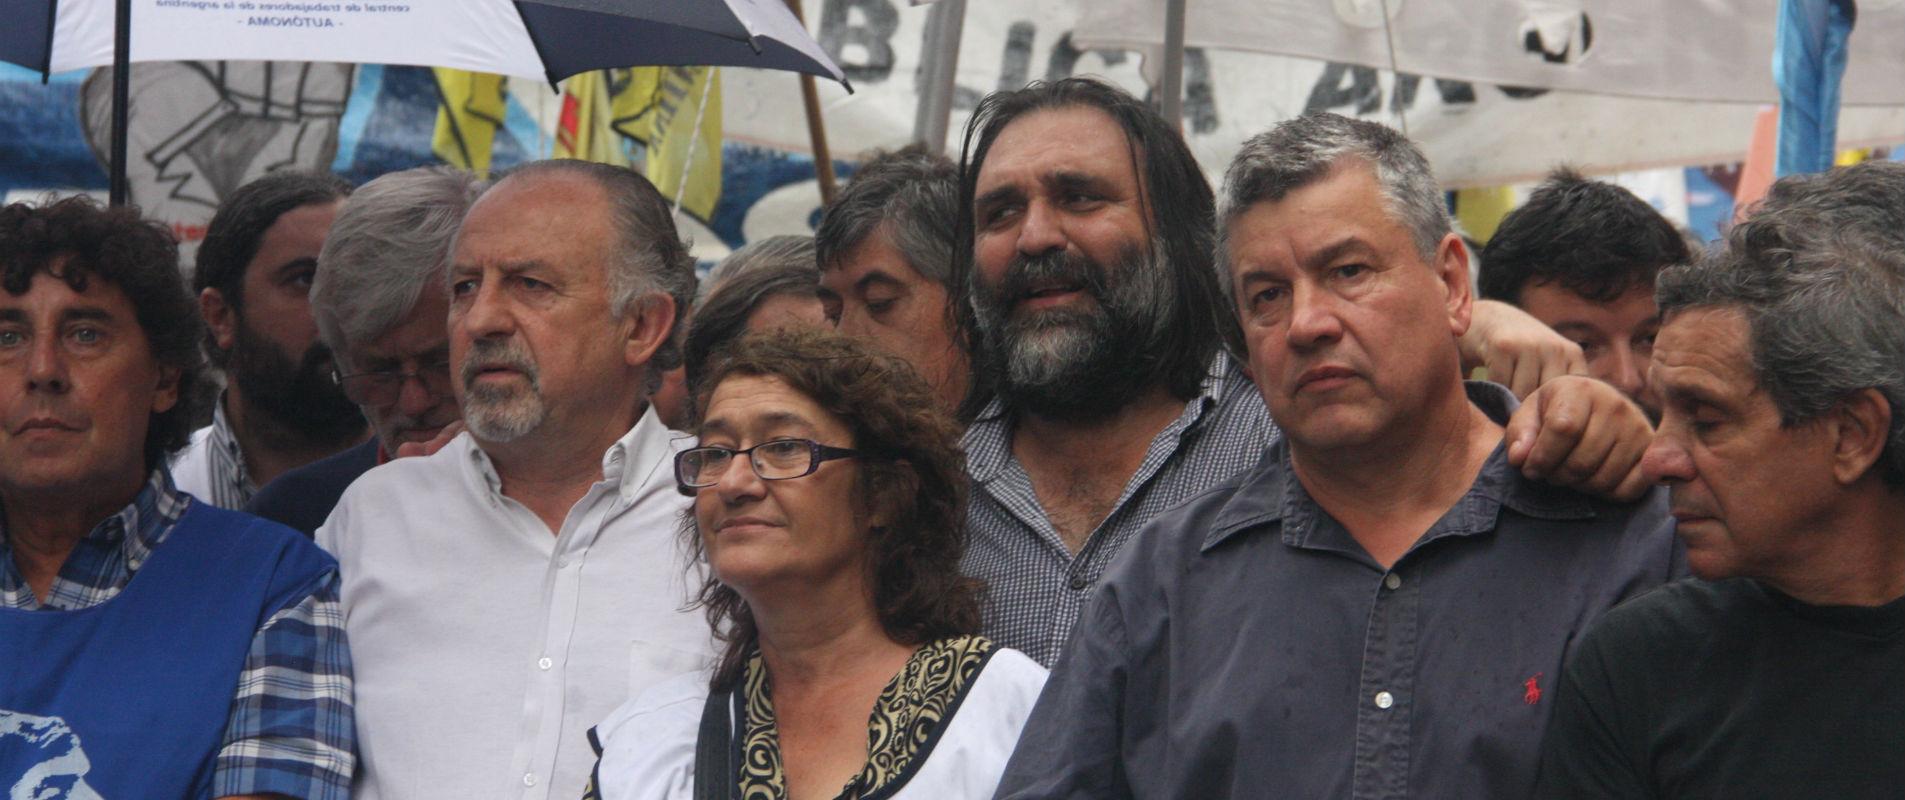 Michelli, Yasky,  Alesso, Baradel y Pedro Wasiejko